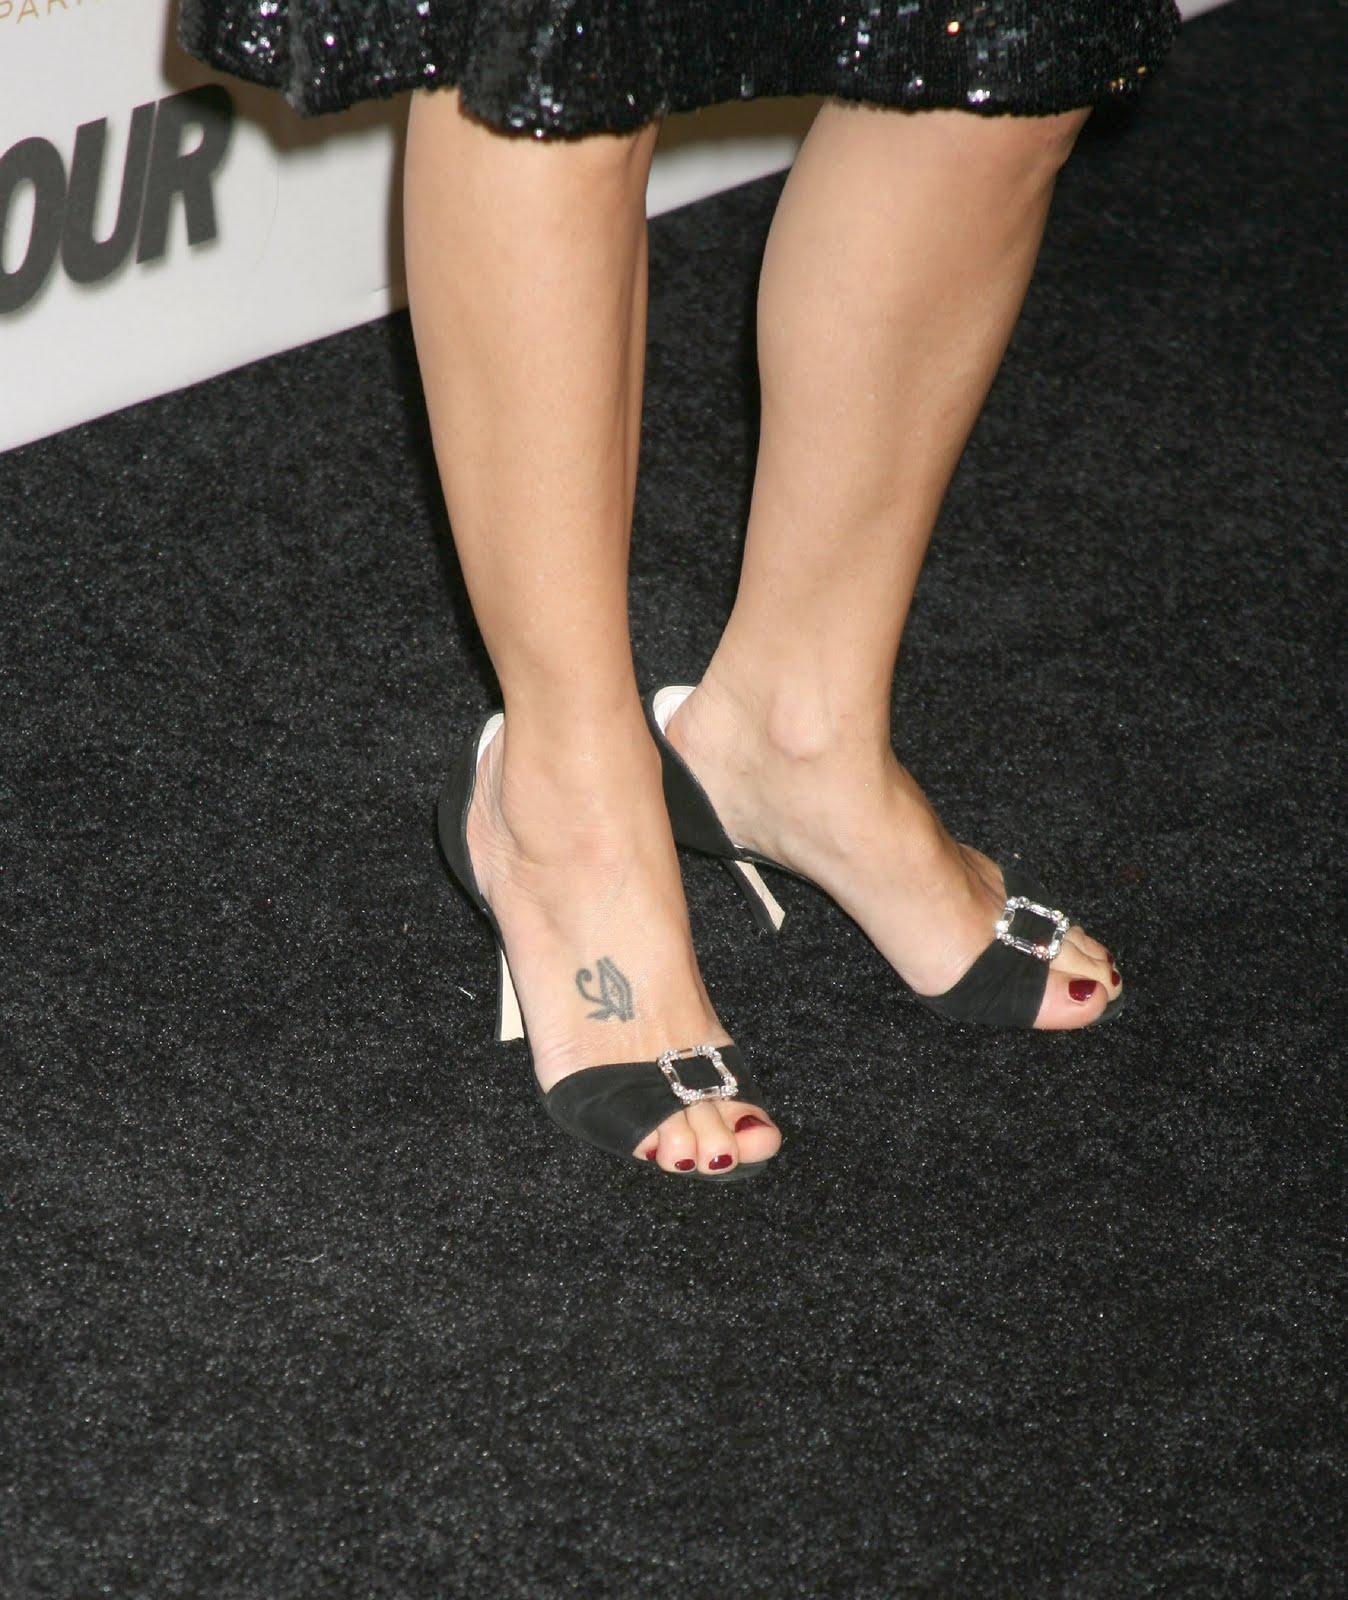 http://4.bp.blogspot.com/_UaLWp72nij4/TAVvaYg3bYI/AAAAAAAANOg/pb4WSqvG76k/s1600/marisa-tomei-feet-5.jpg